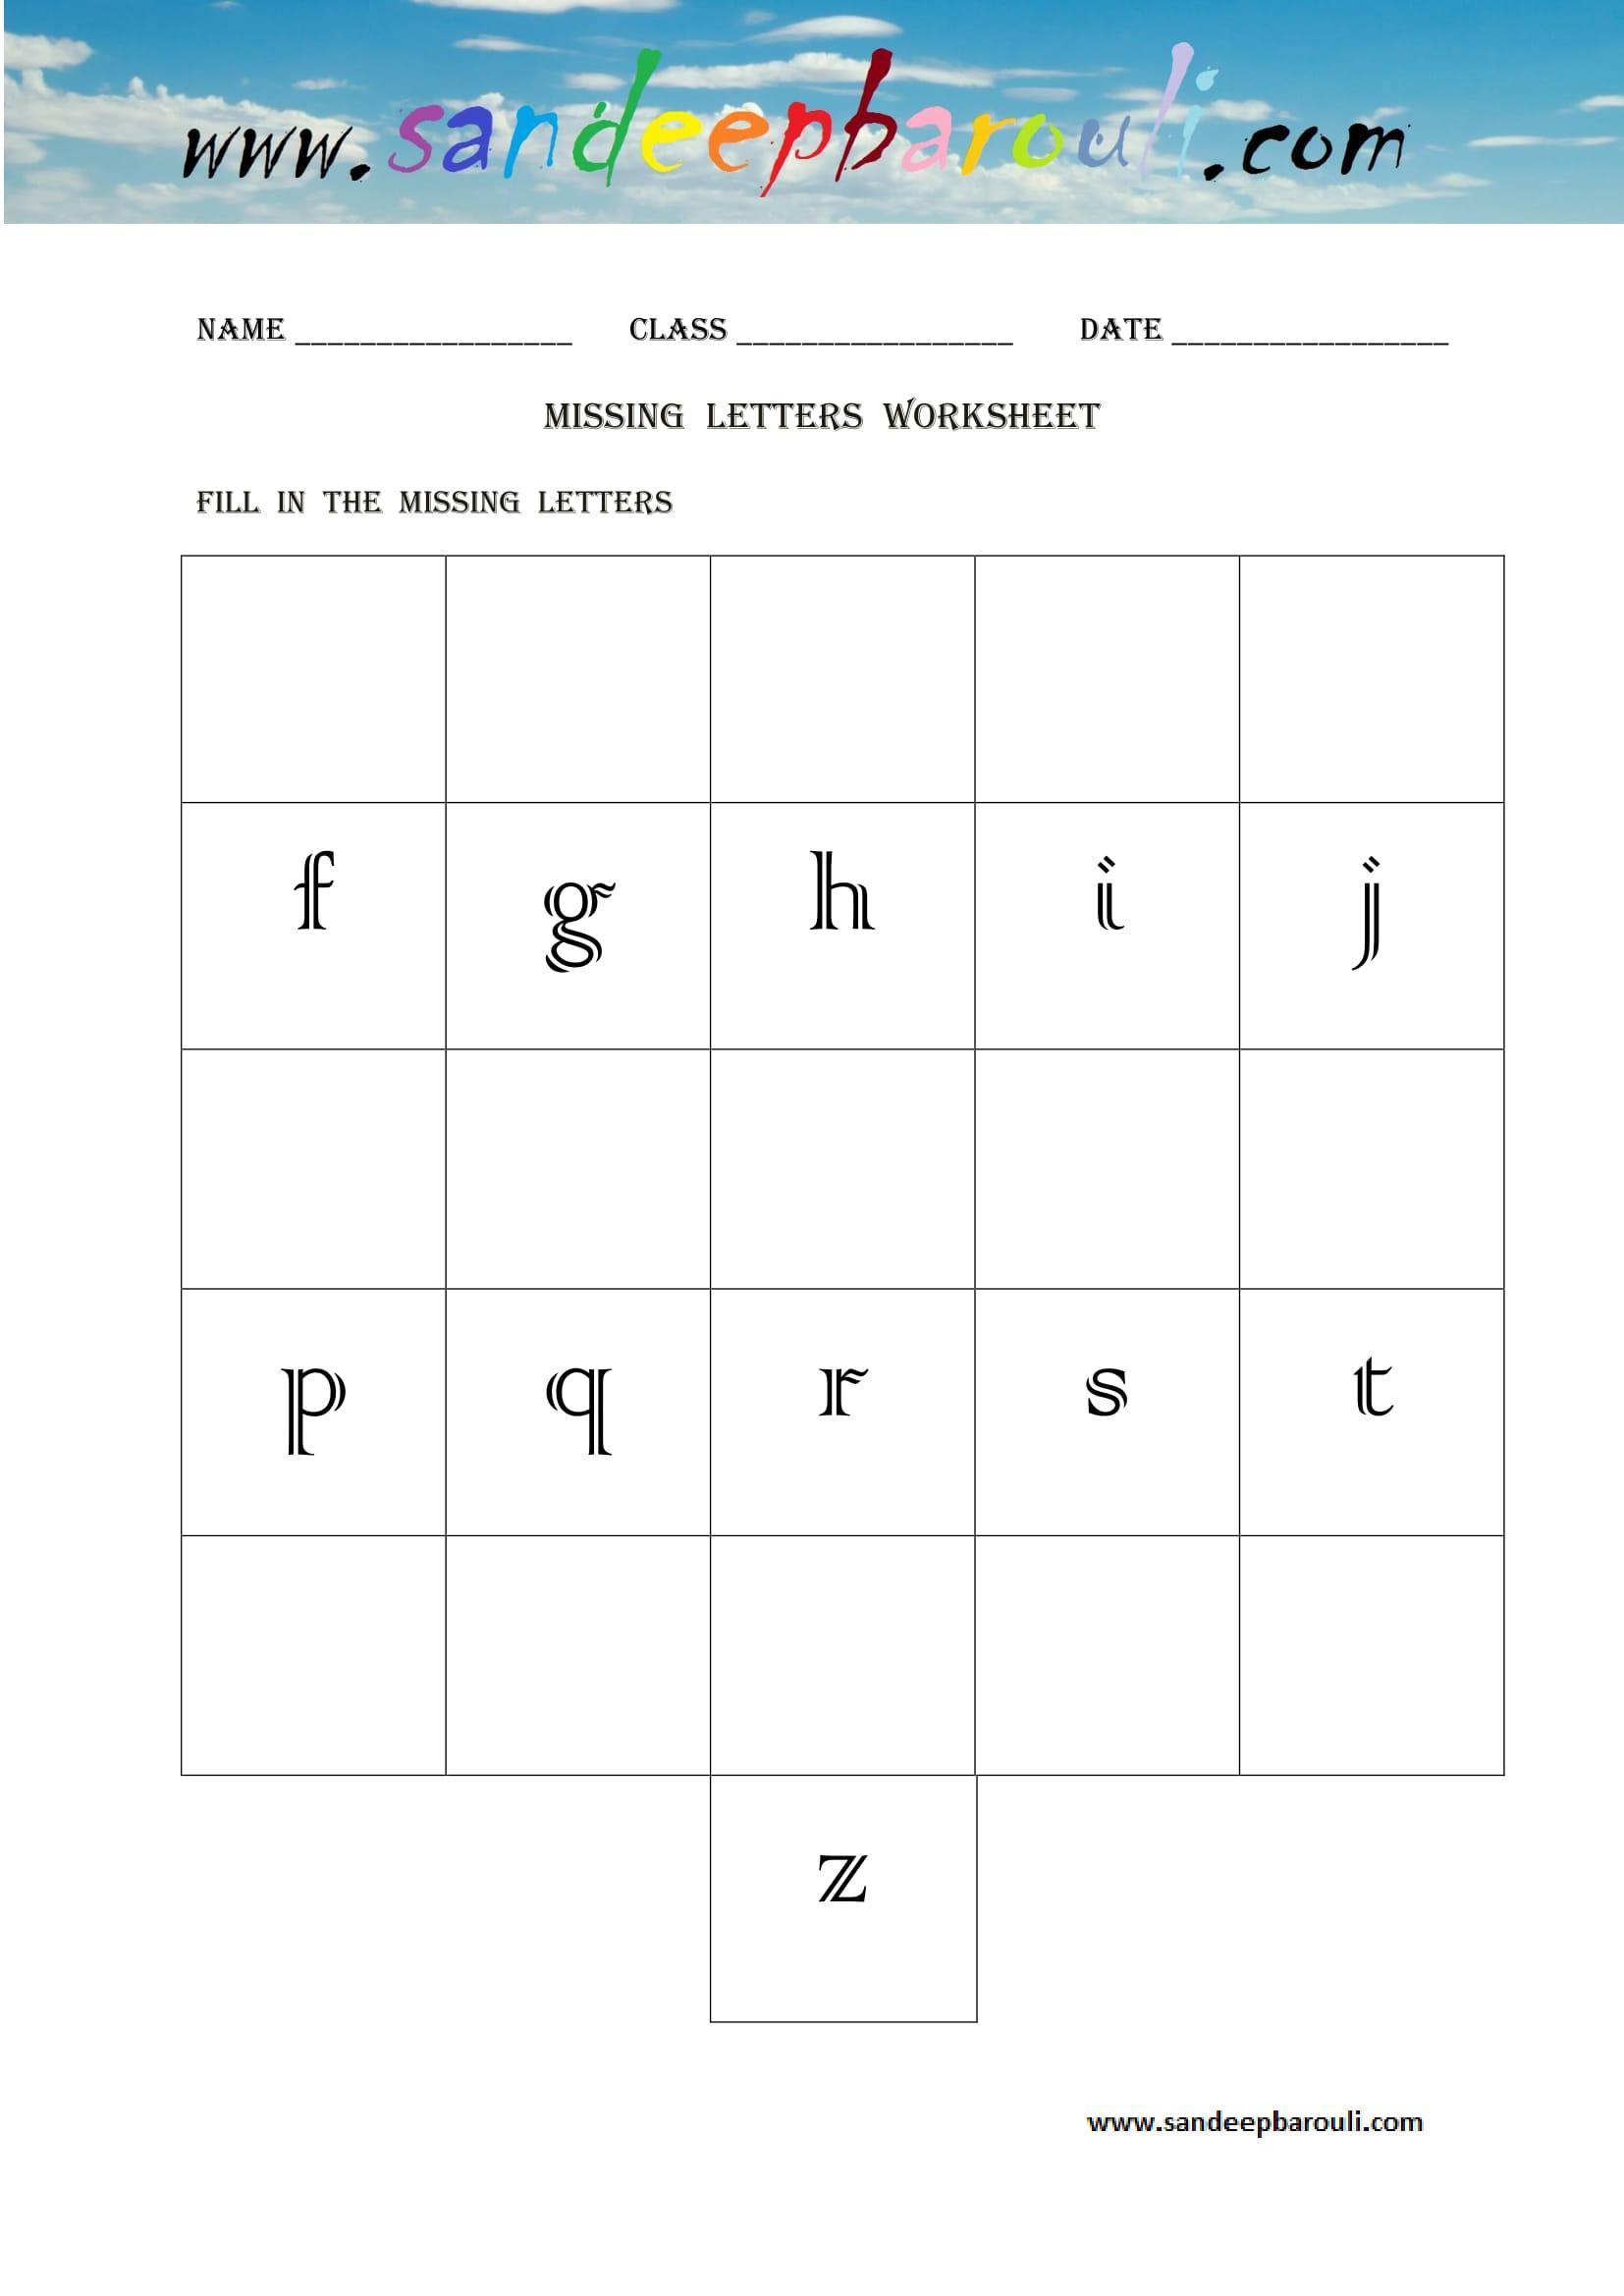 Missing Letters Worksheets Sandeepbarouli